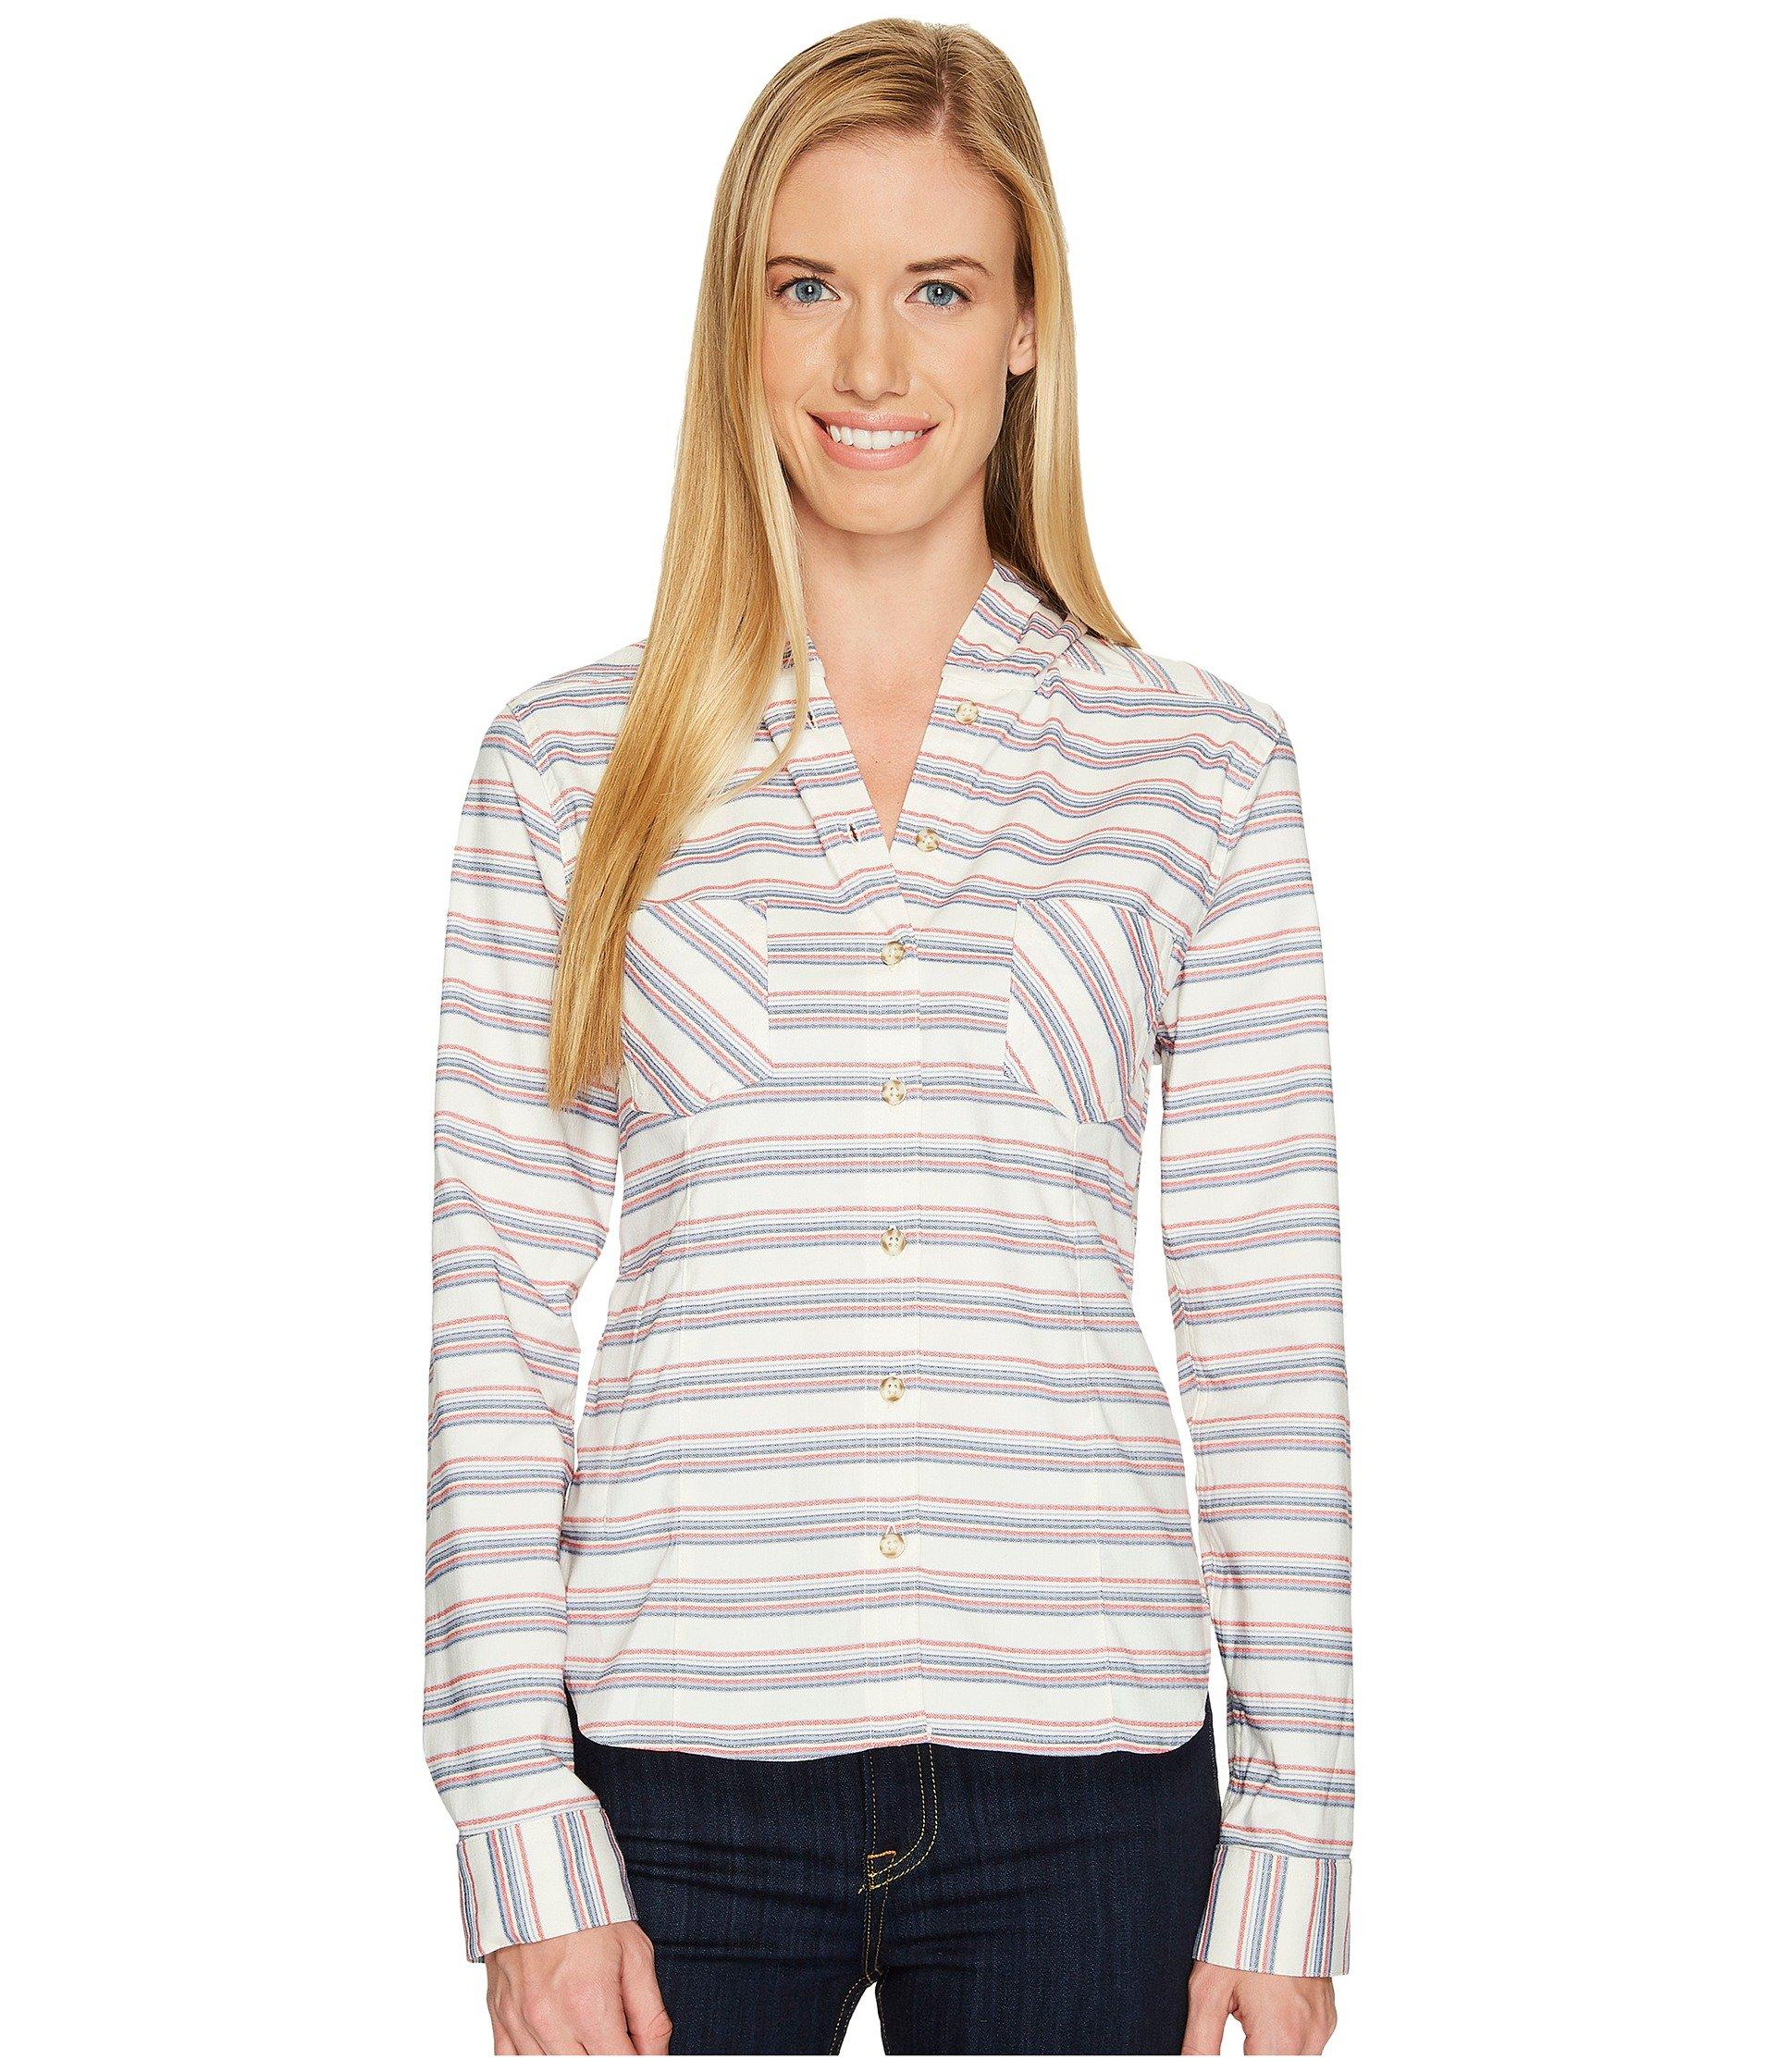 MOUNTAIN HARDWEAR Acadia Stretch Hooded Long Sleeve Shirt, Cotton